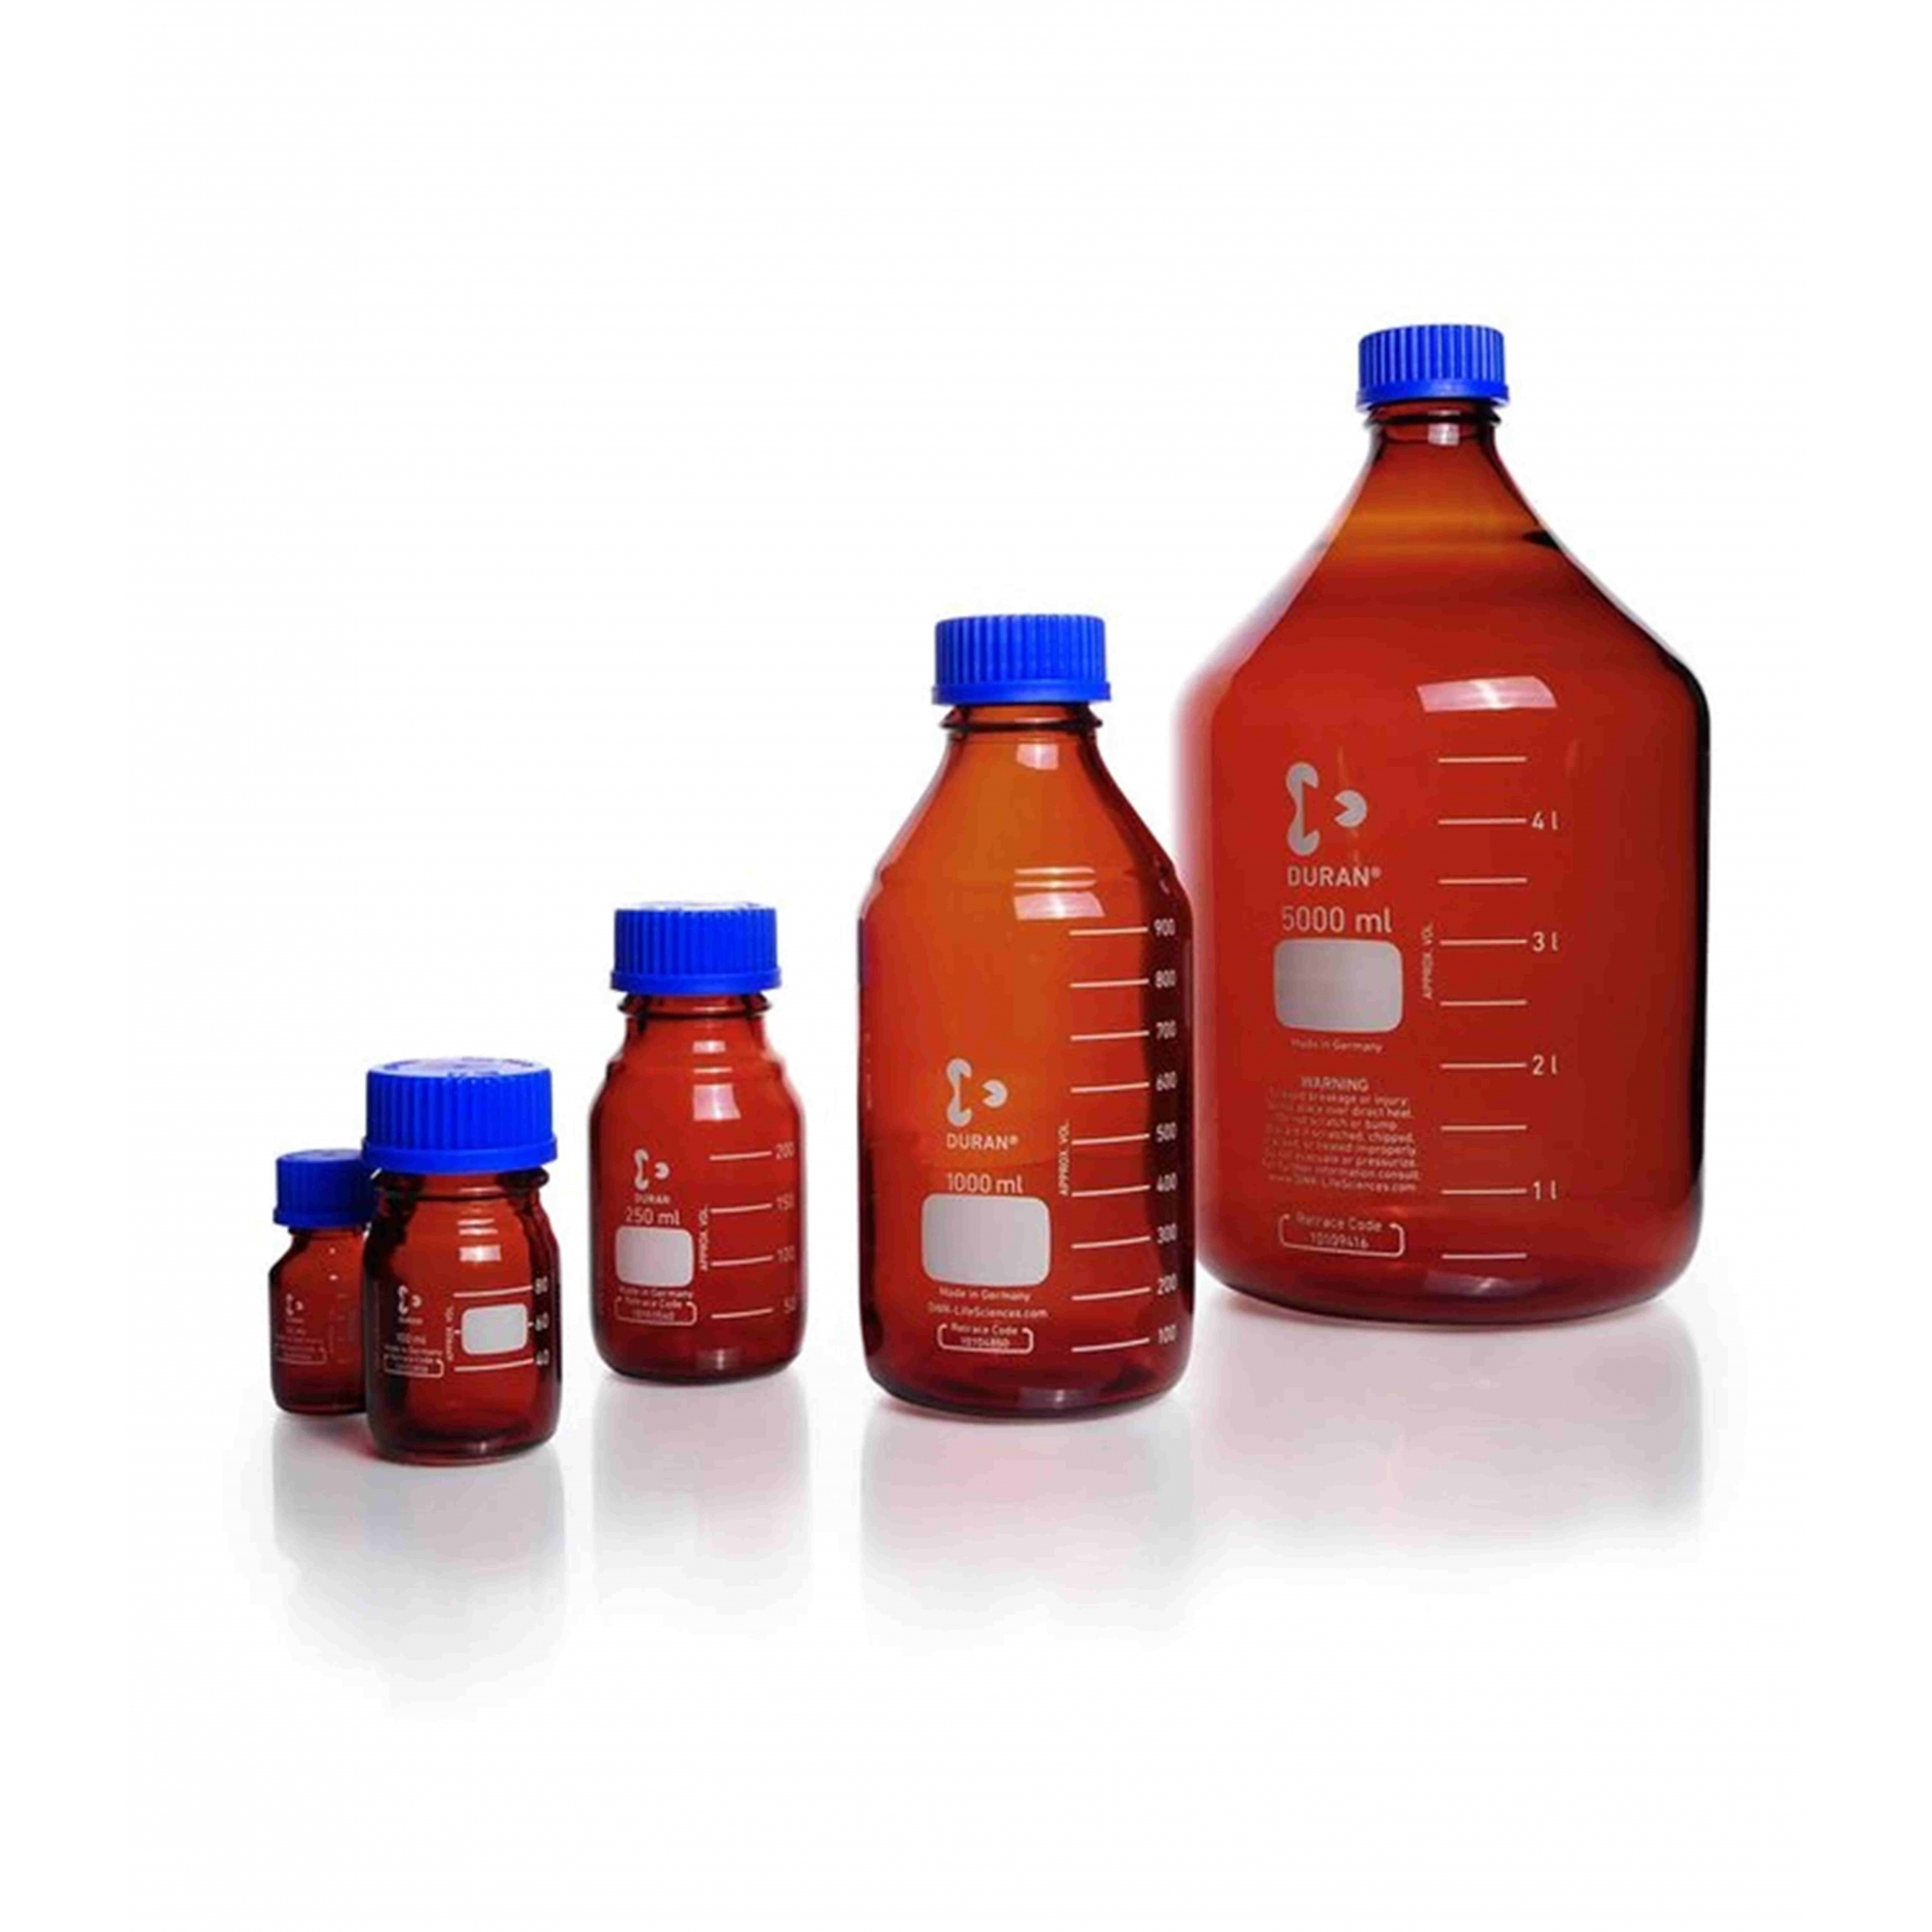 Frasco Reagente Âmbar Tampa Azul 150 ml - Schott - Cód. 21806295